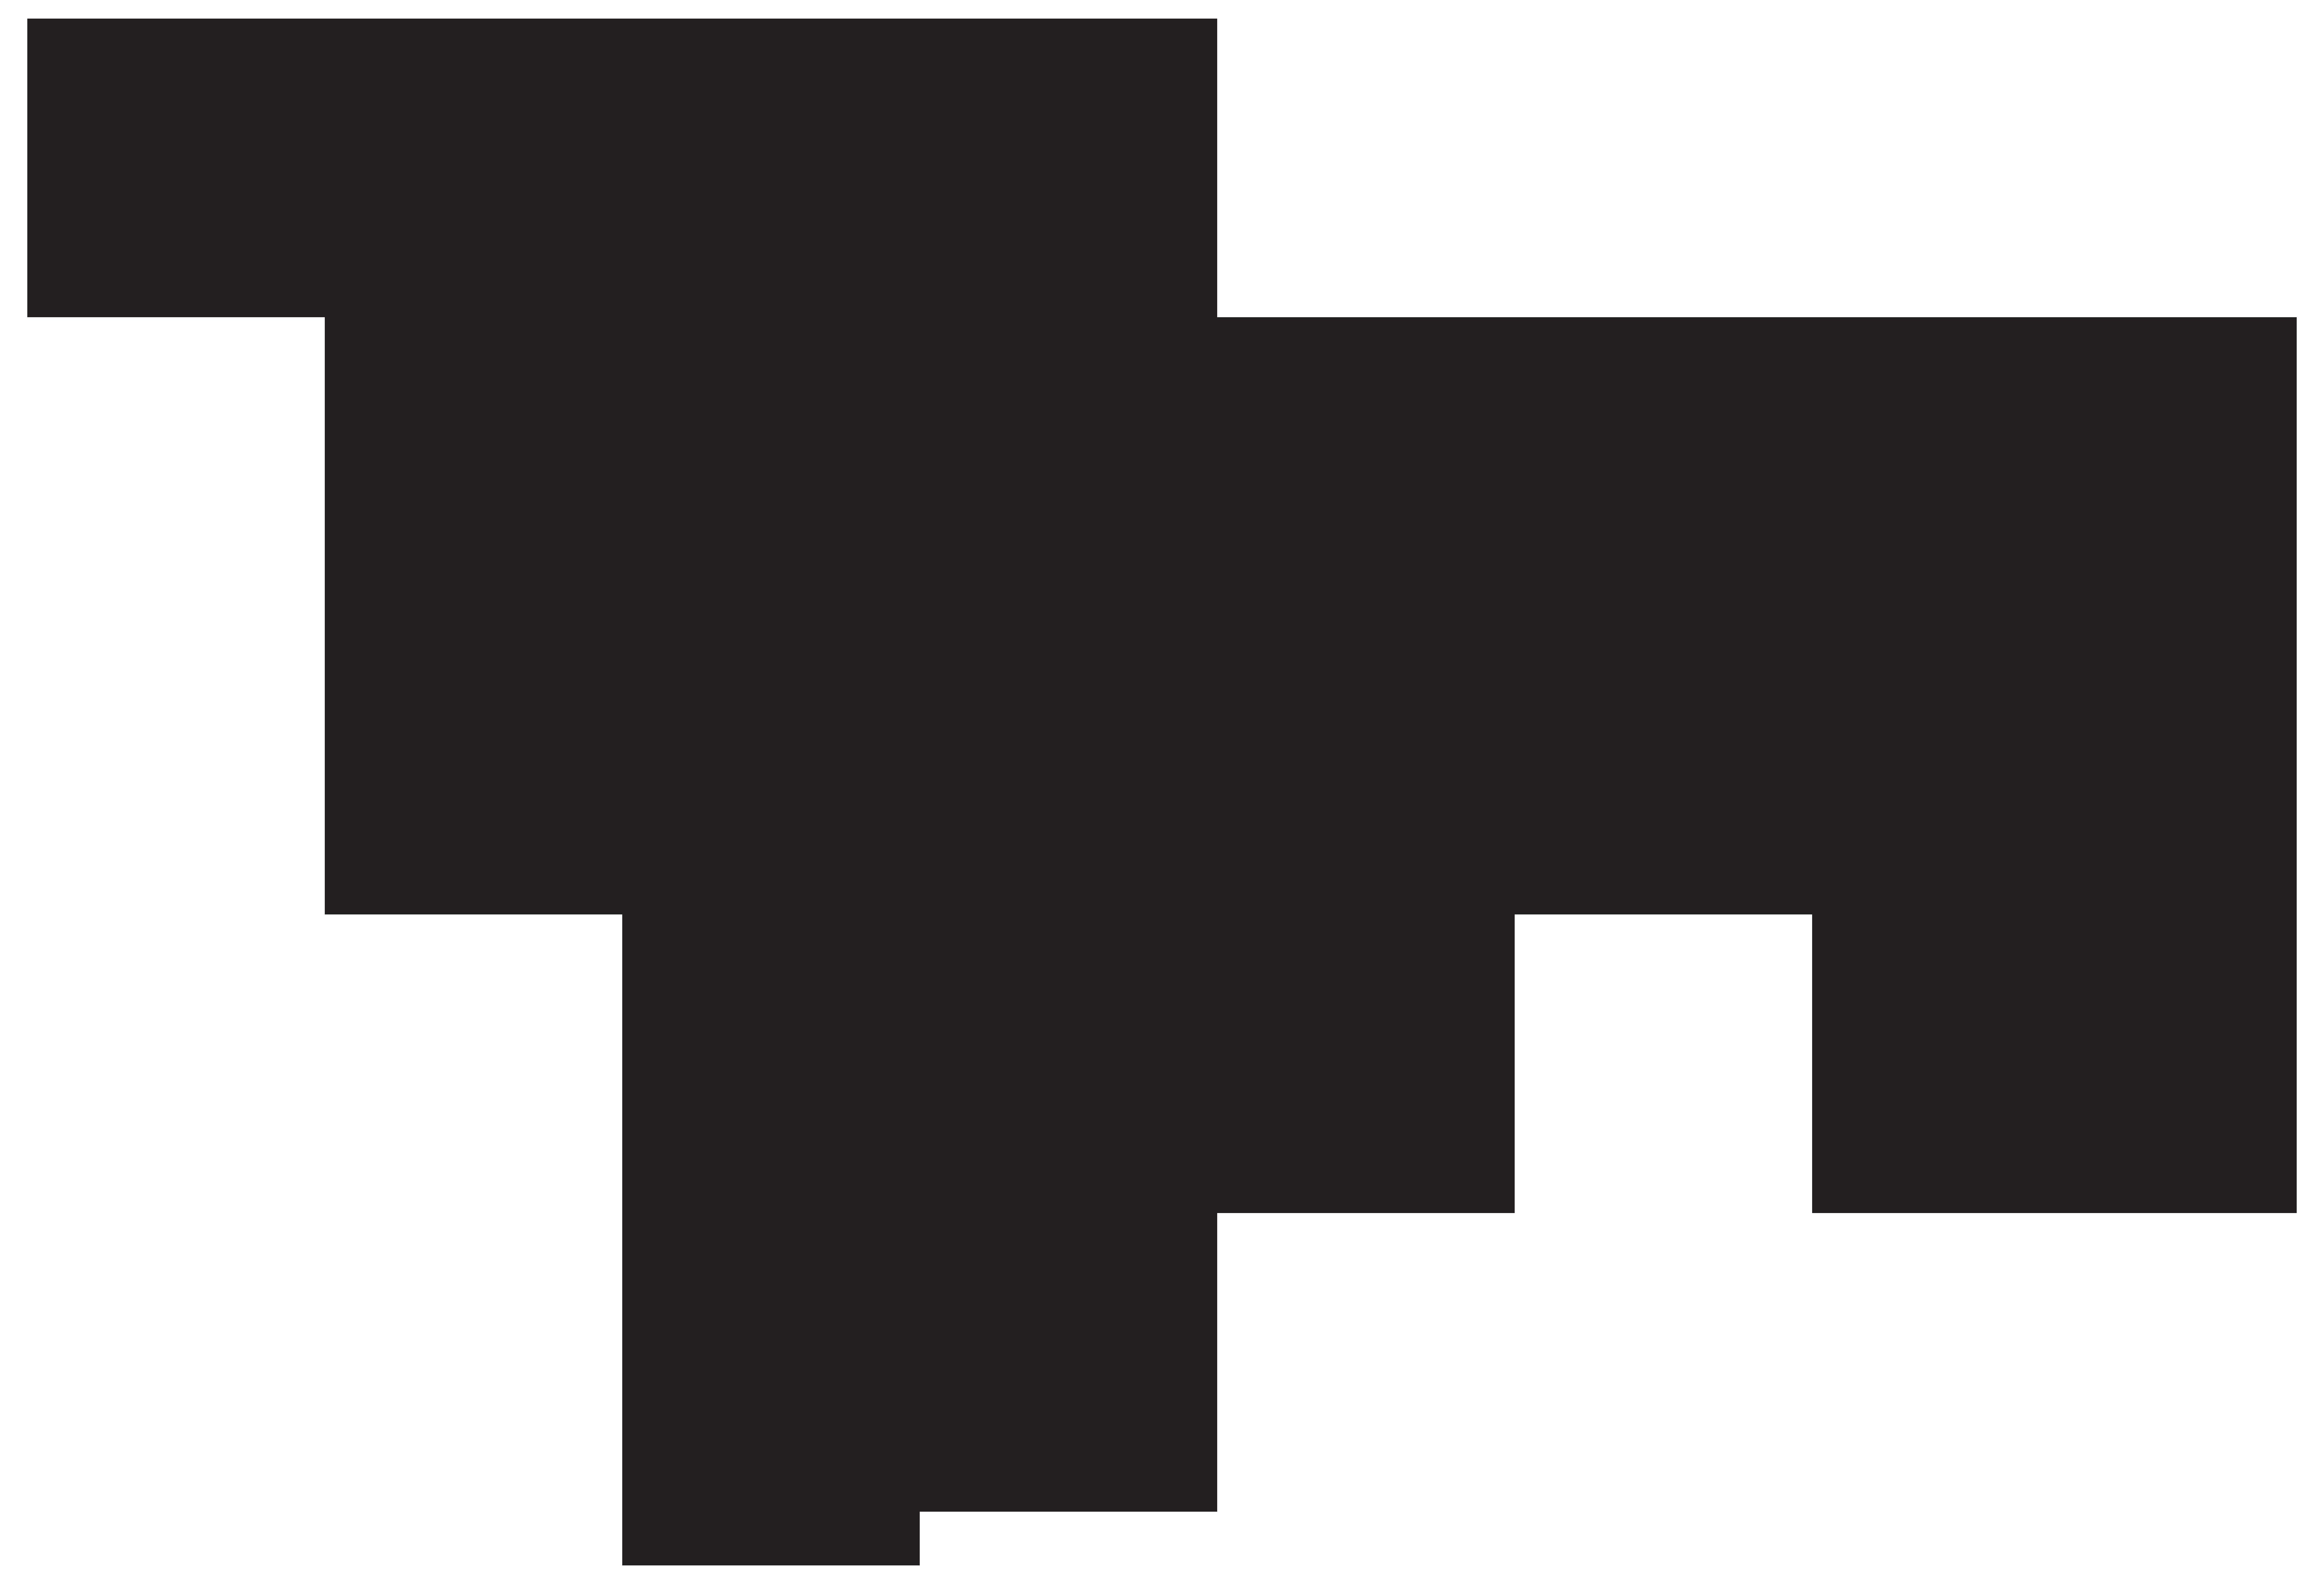 Crow Silhouette Pattern Crow Clip Art Crow Silhouette Bird Silhouette Crow Painting